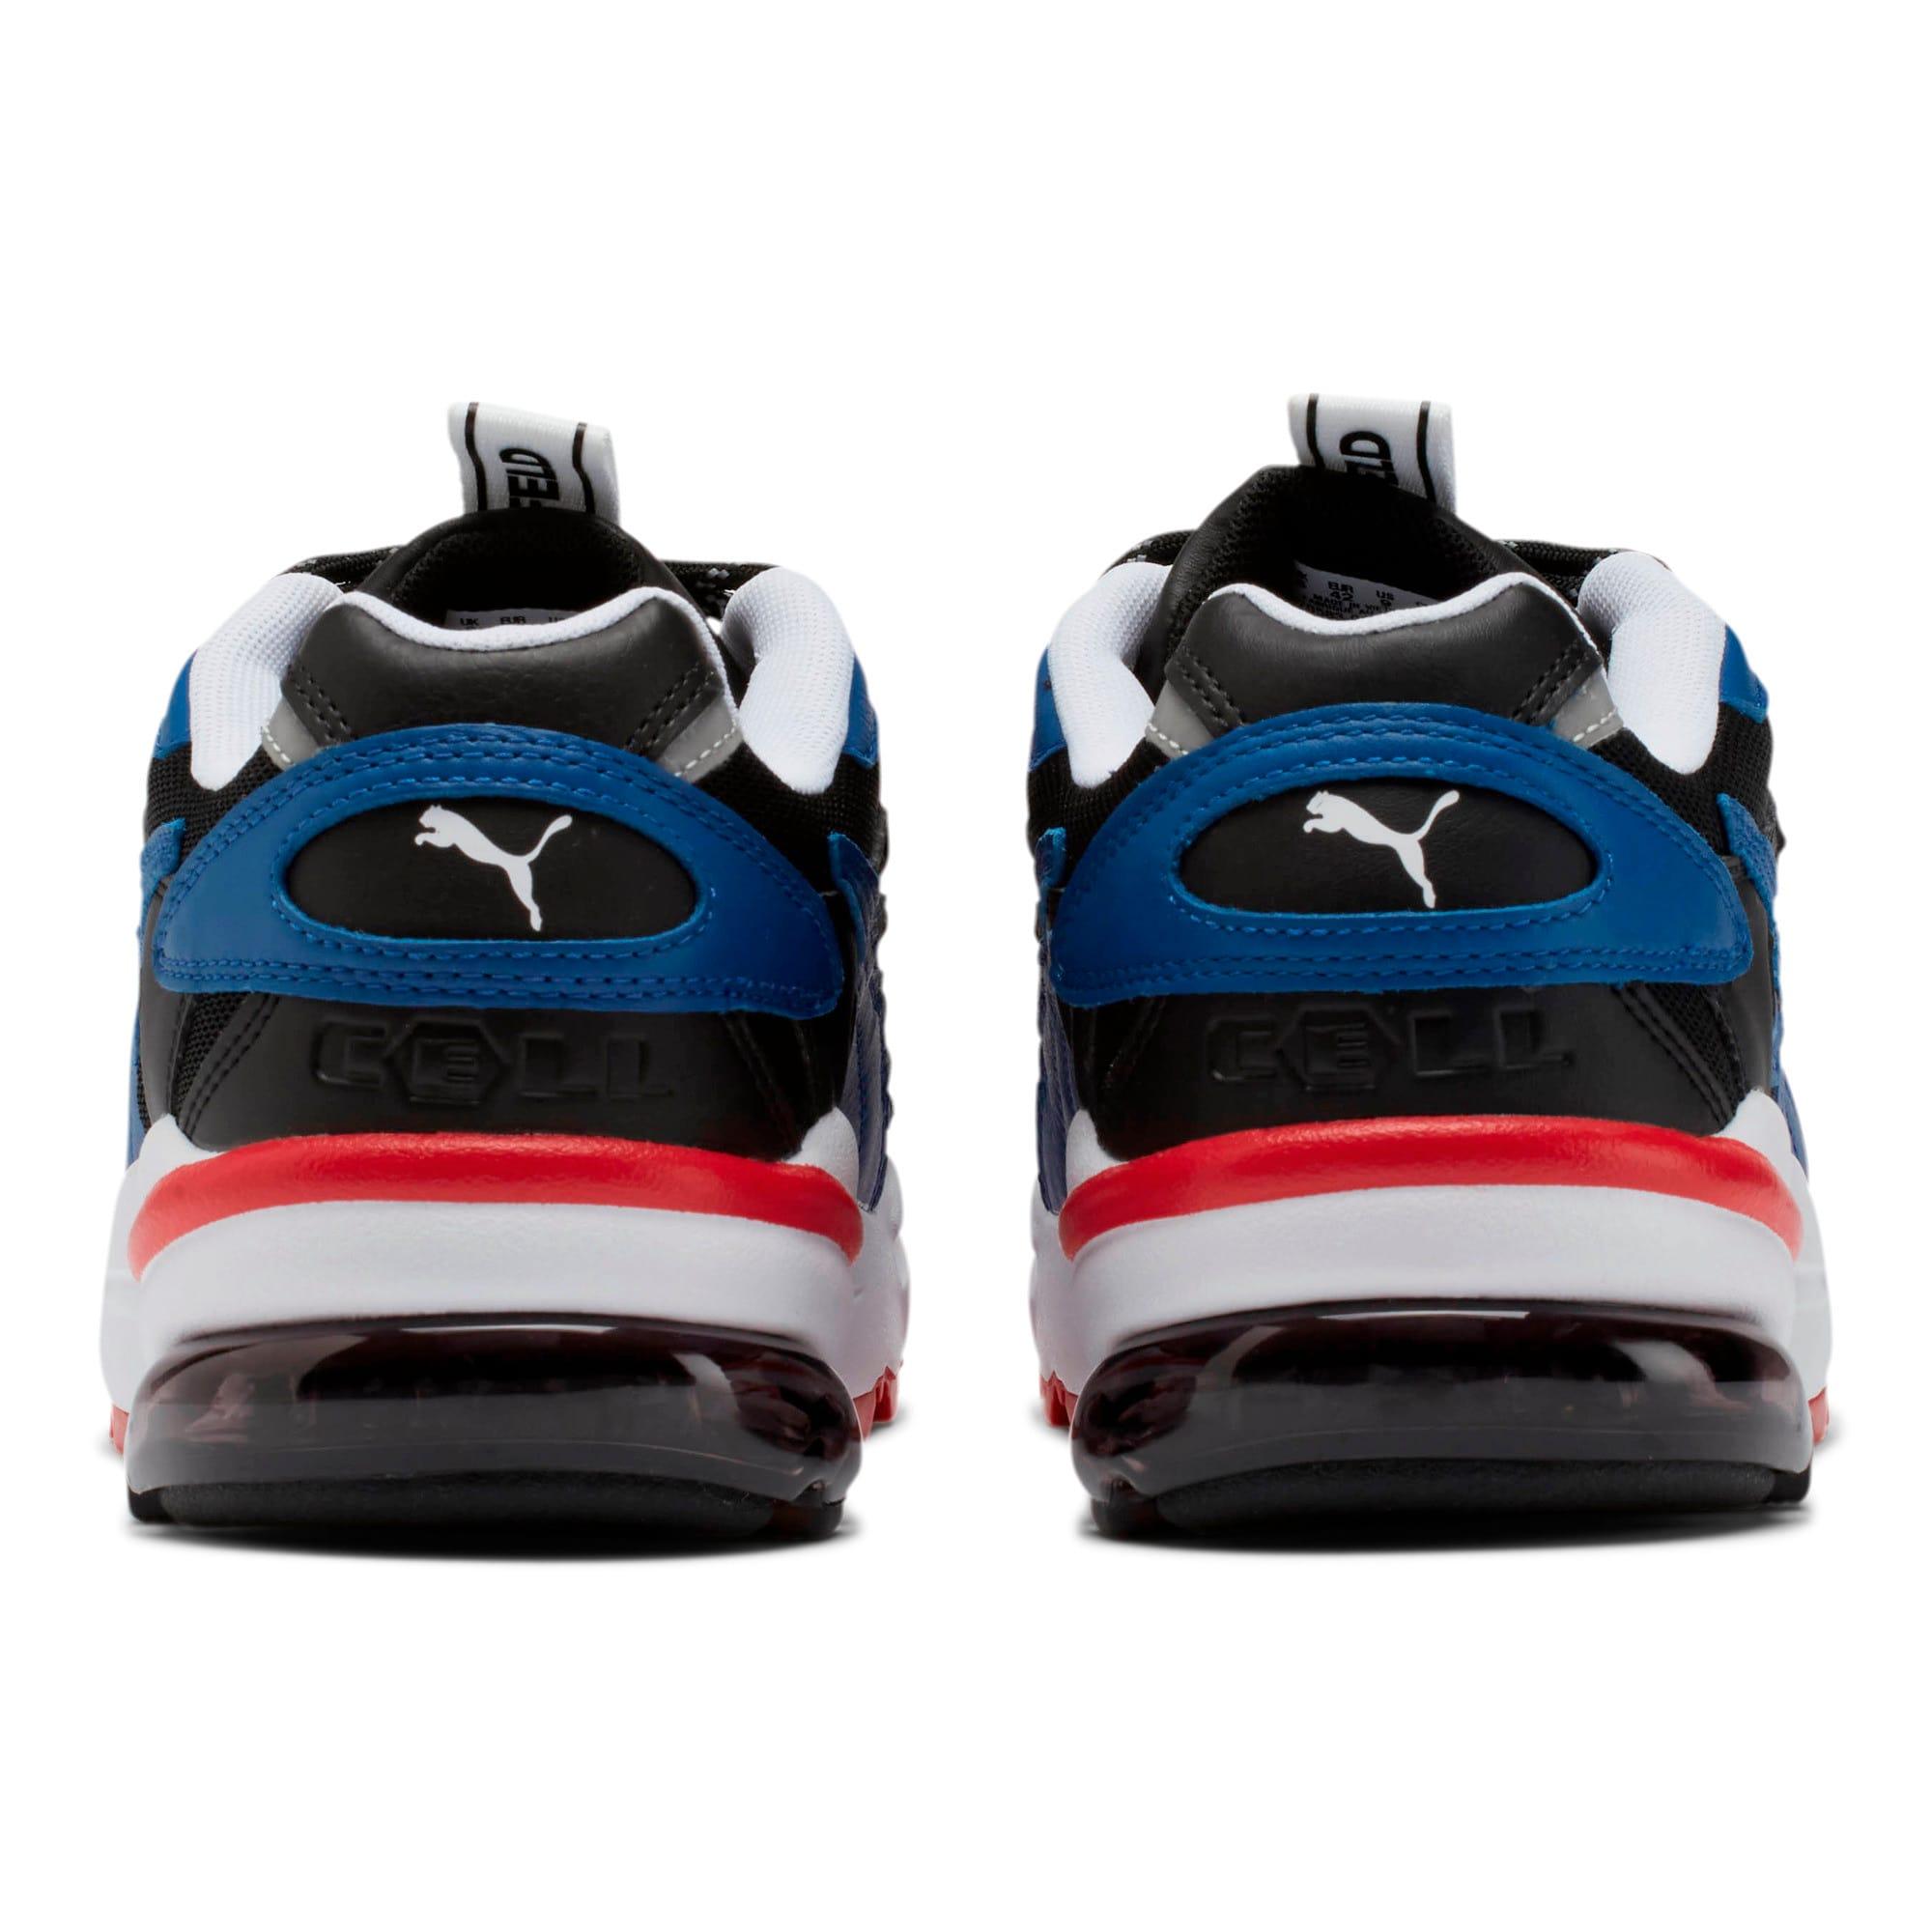 Miniatura 4 de Zapatos deportivos CELL Alien PUMA x KARL LAGERFELD, Puma Black-TRUE BLUE, mediano